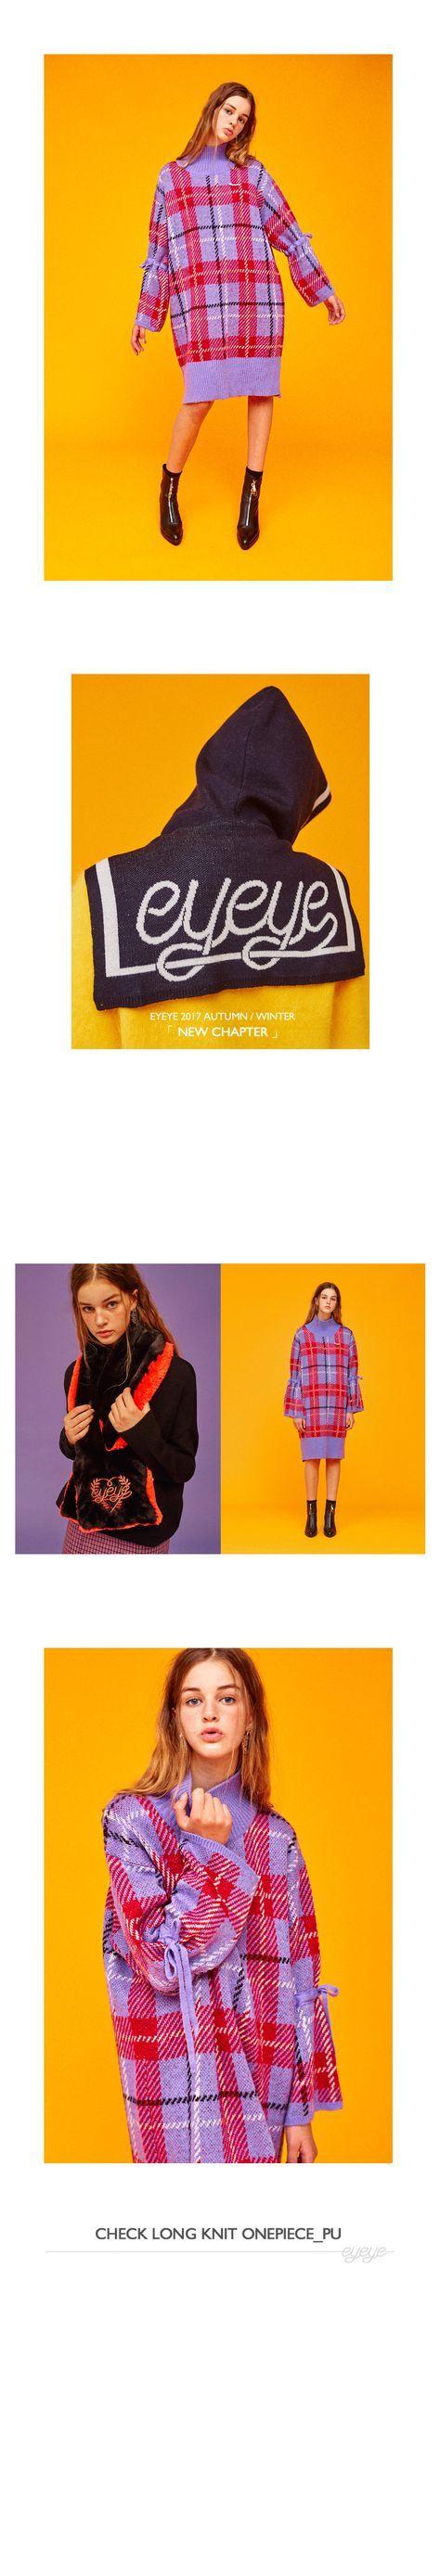 21 Best Christmas Gifts Images On Pinterest Tendencies Tshirt Japan Soda Hitam Xl Eyeye Check Long Knit Dress Purple Eeoe4opl02w